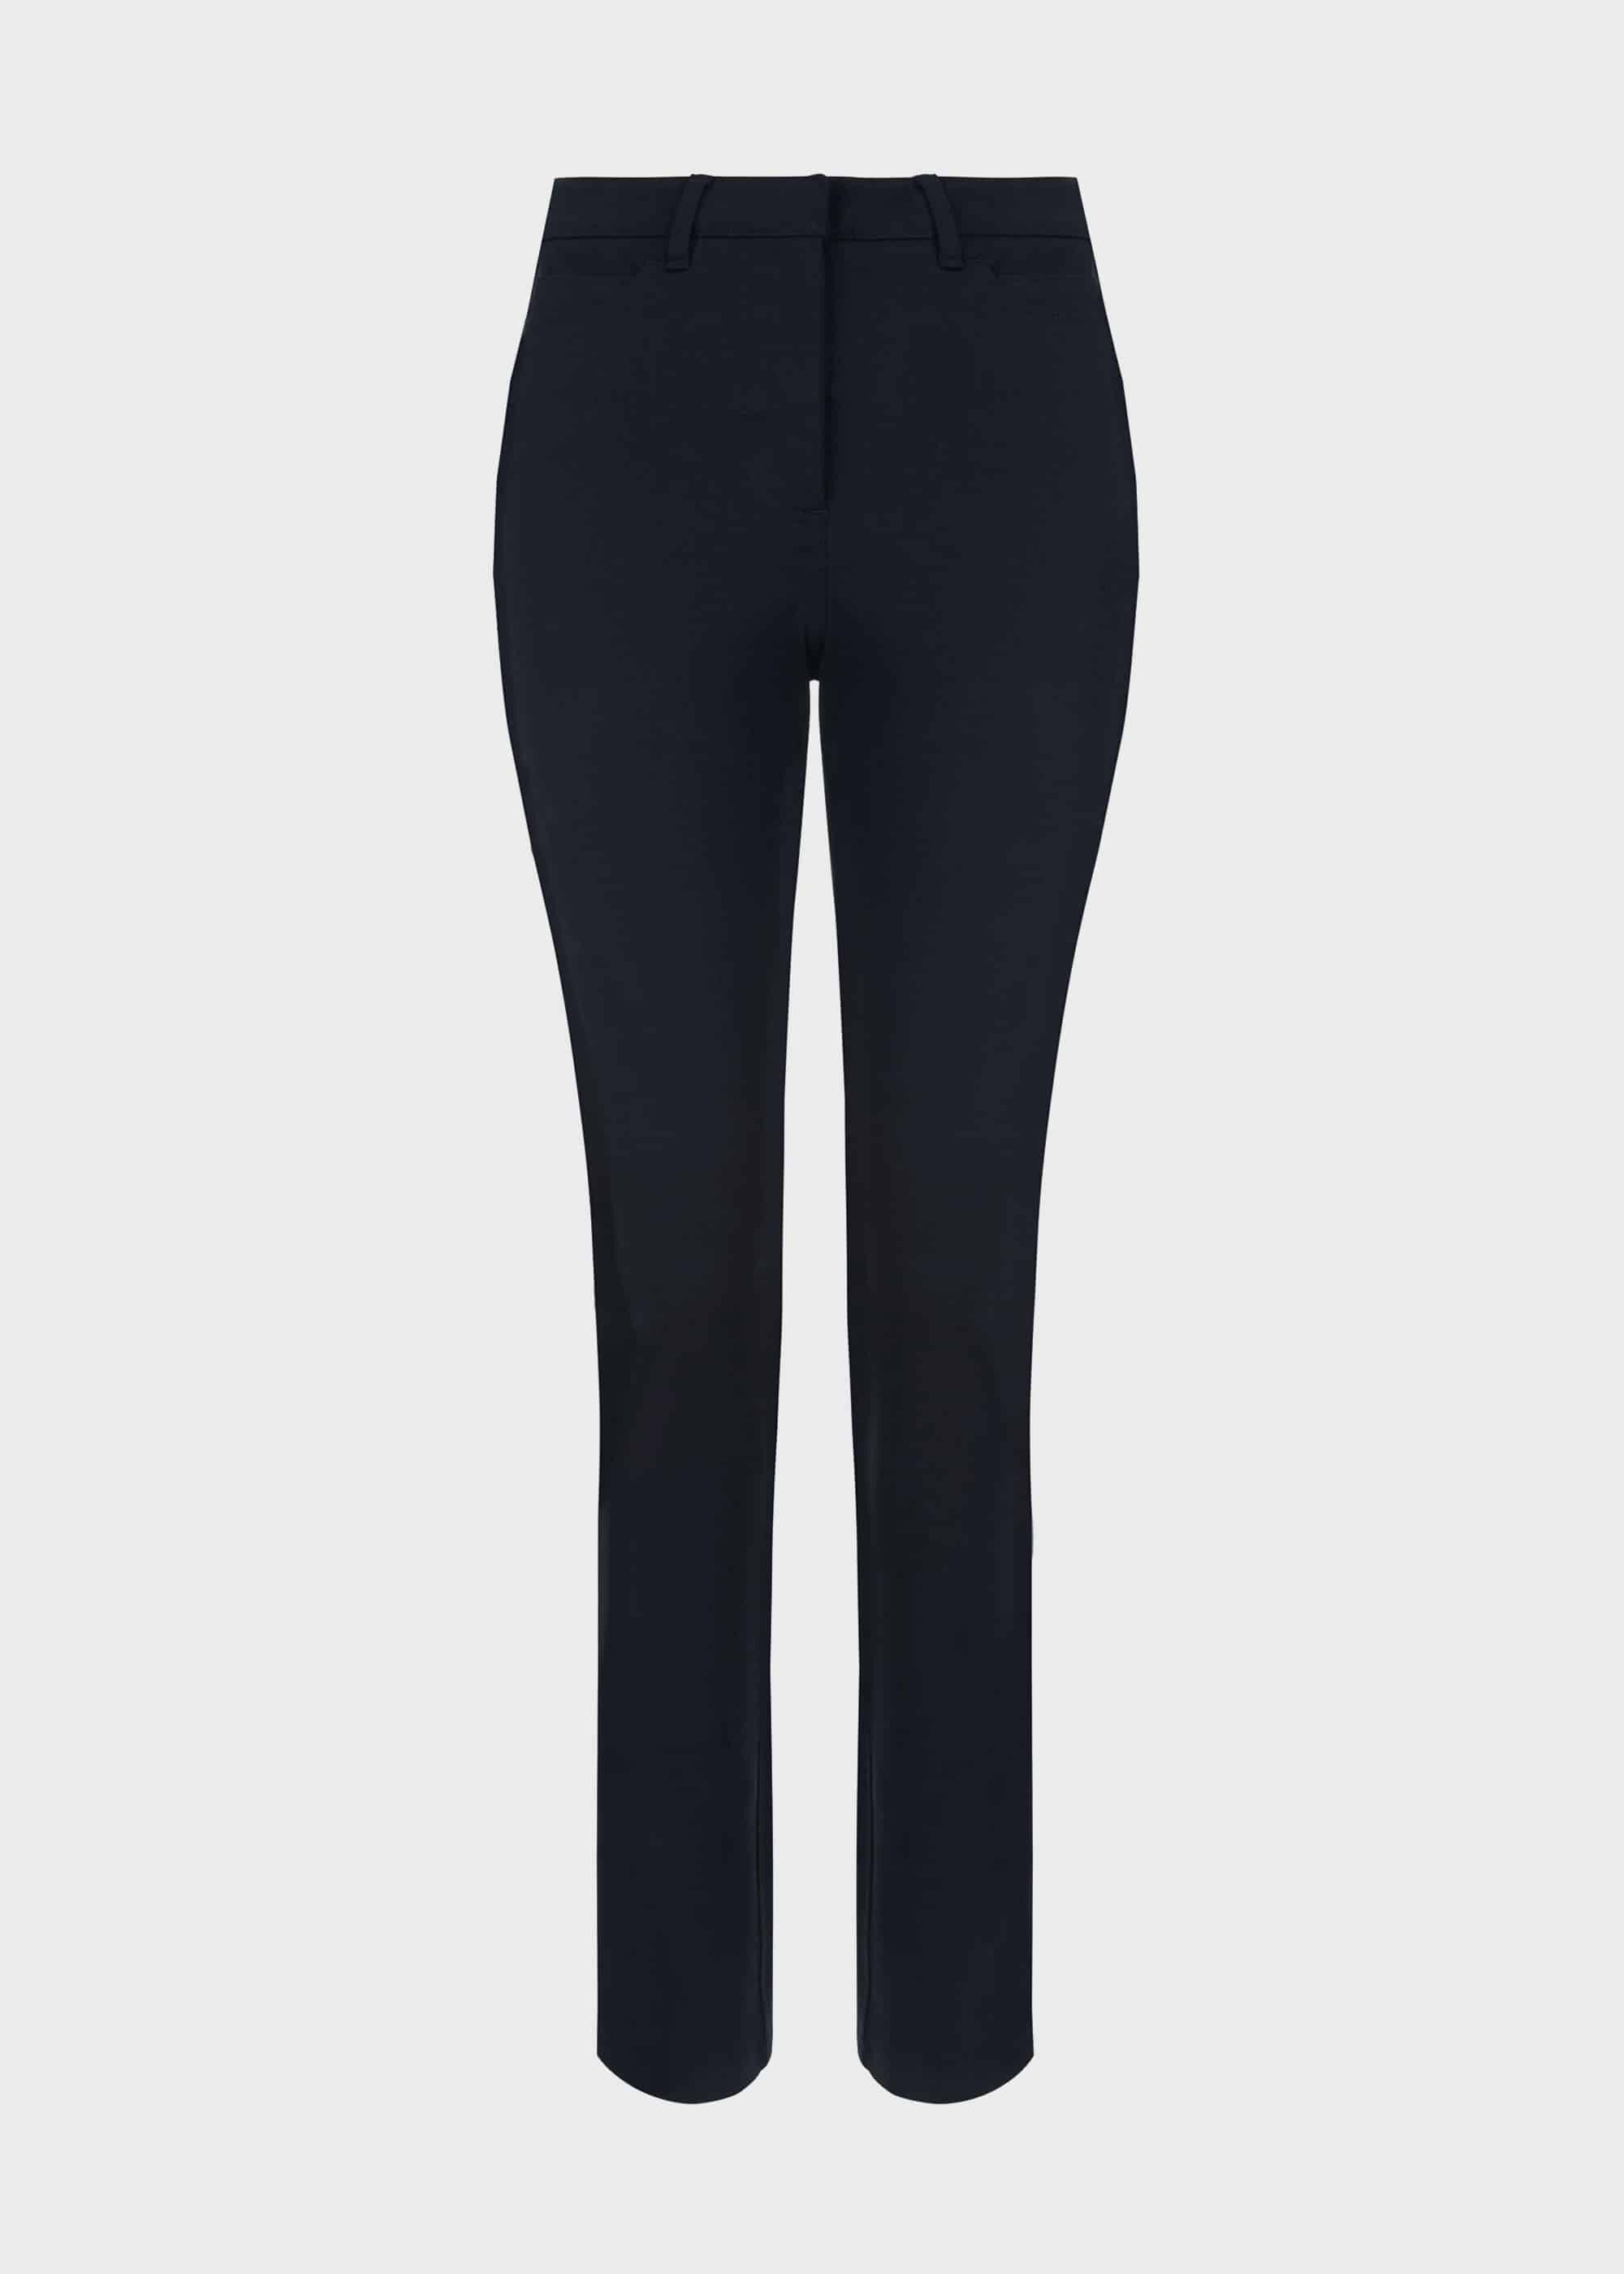 Hobbs Amanda Navy Jeans RRP £85. Various Sizes